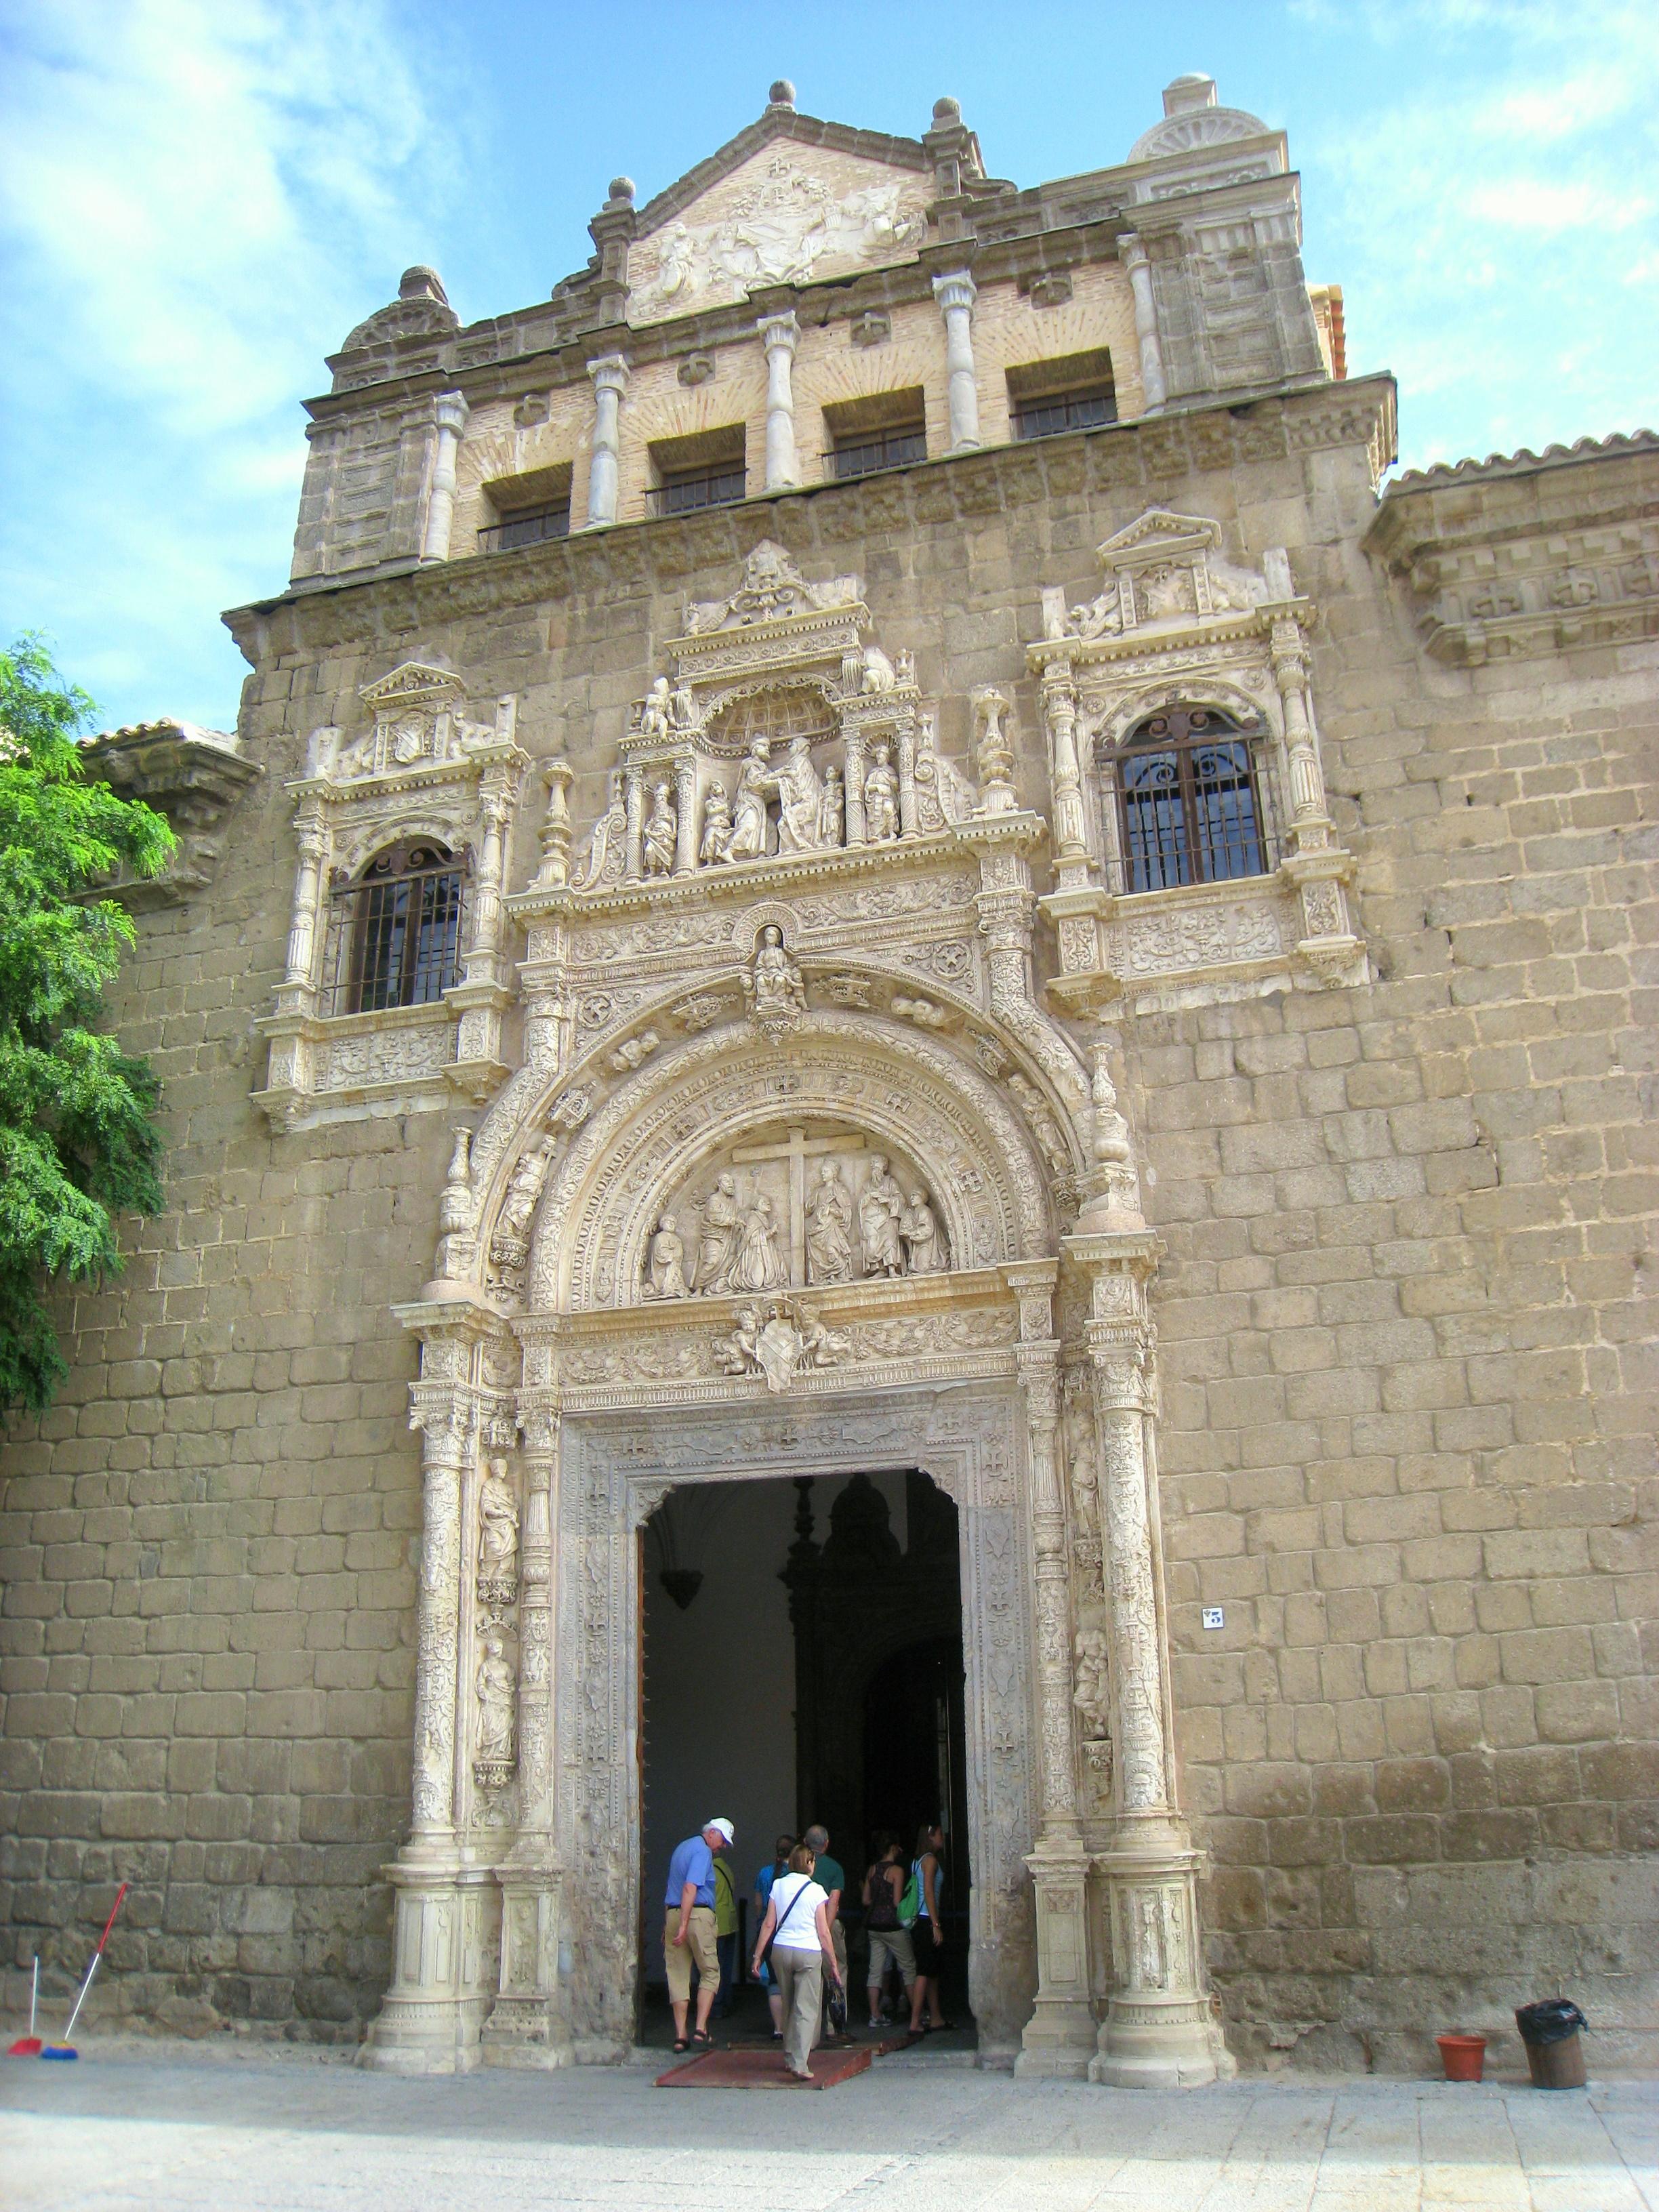 Museo De Santa Cruz.File Museo De Santa Cruz Toledo Facade 1 Jpg Wikimedia Commons